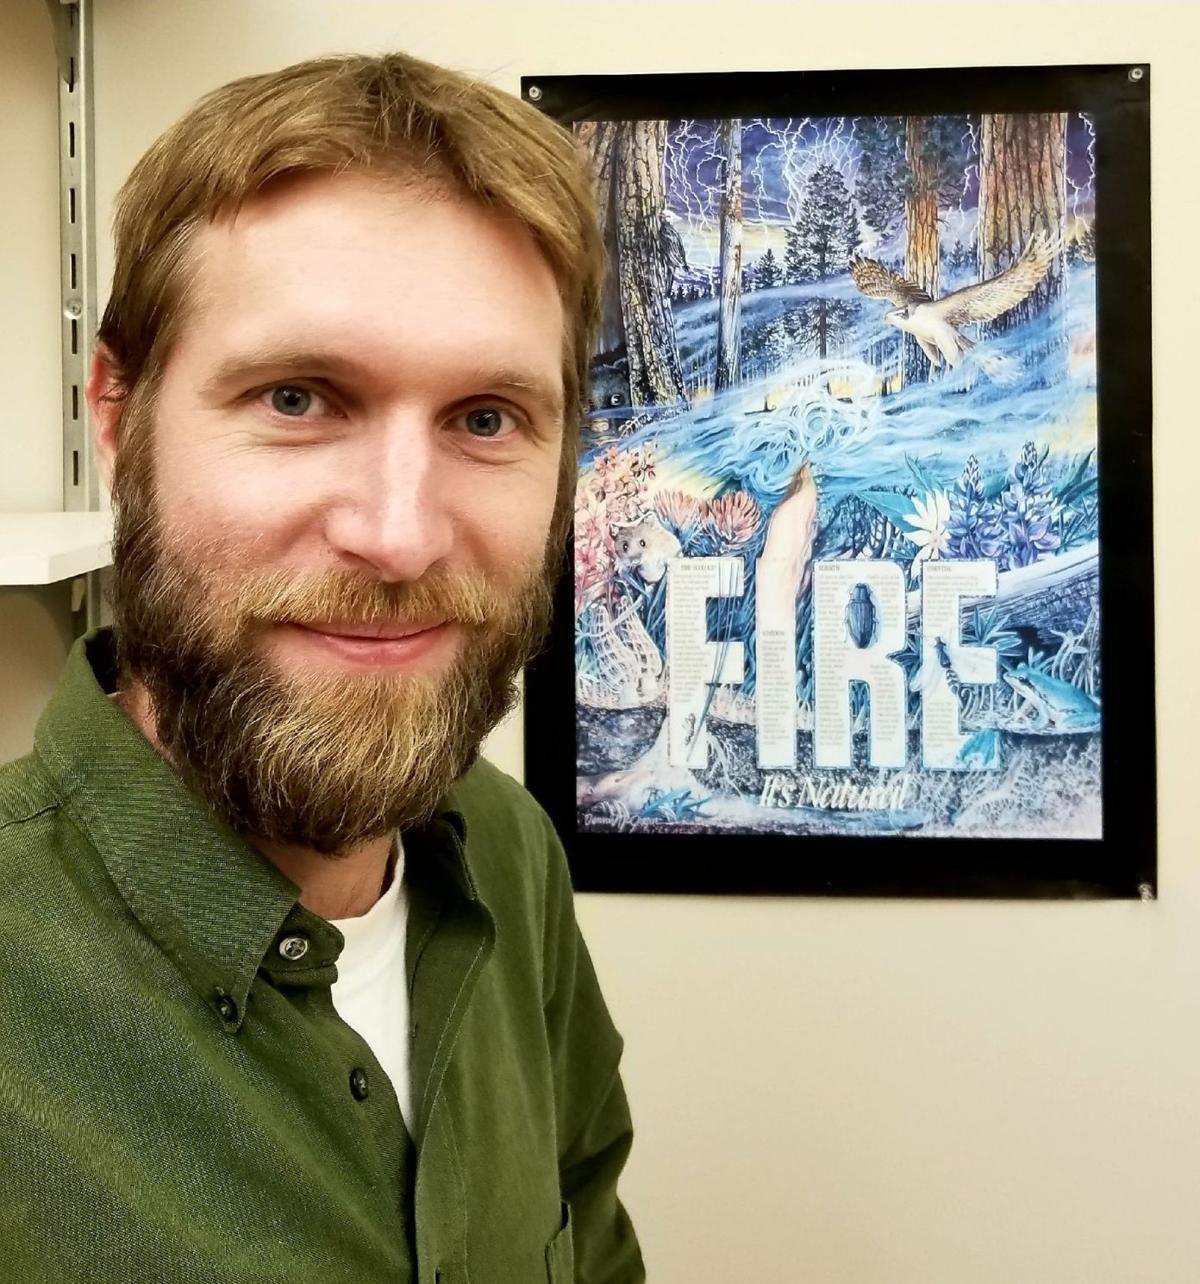 Fire refugia and Garrett Megs photo